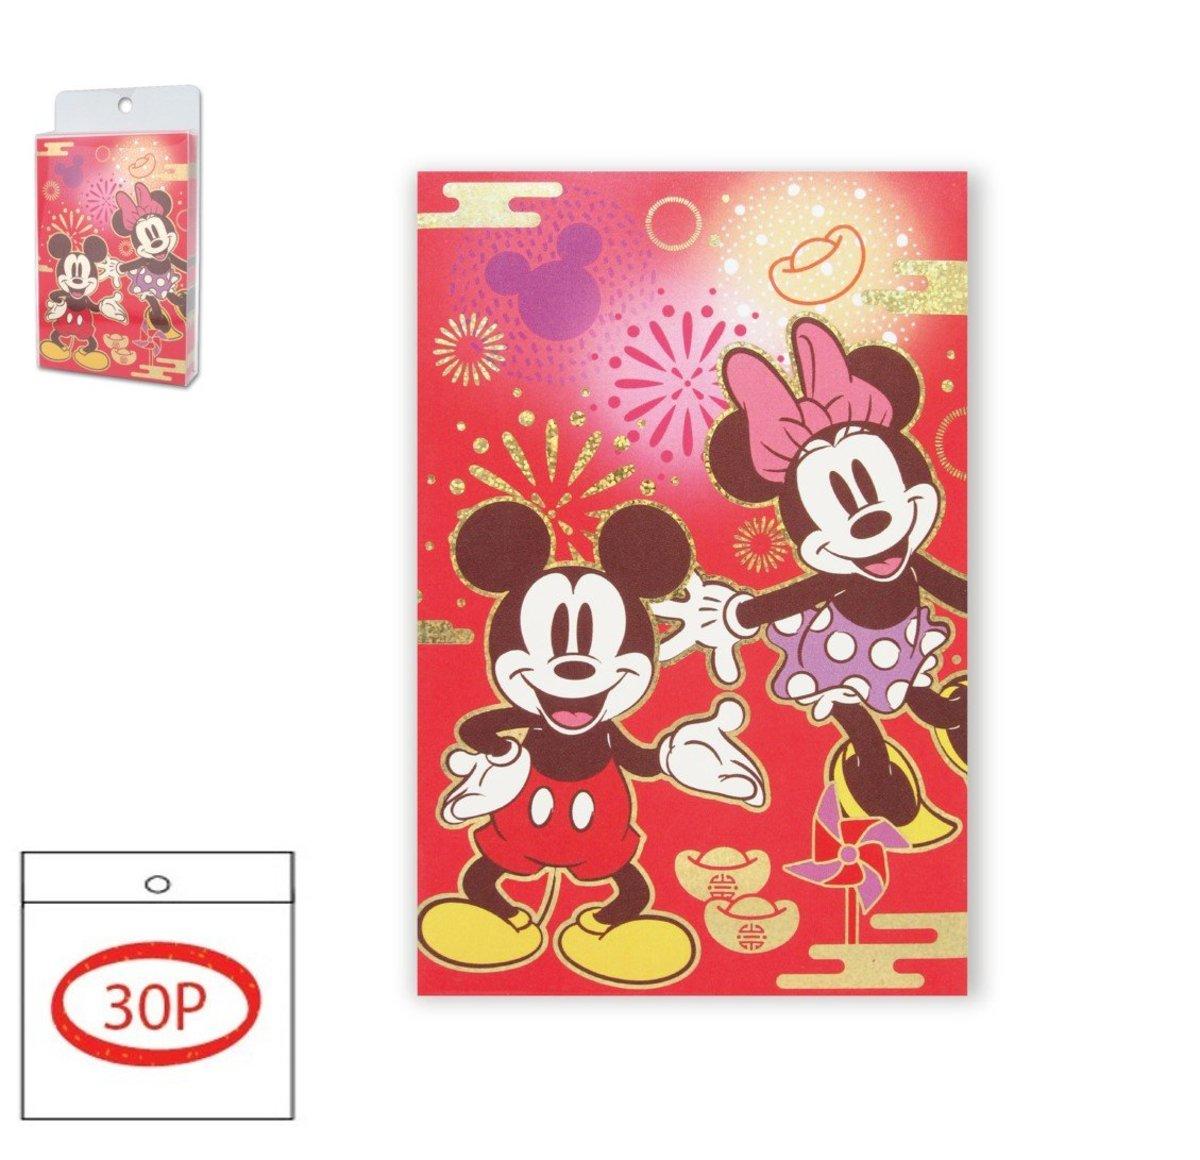 red pocket set G(Rectangular version) 30P(Licensed by Disney)